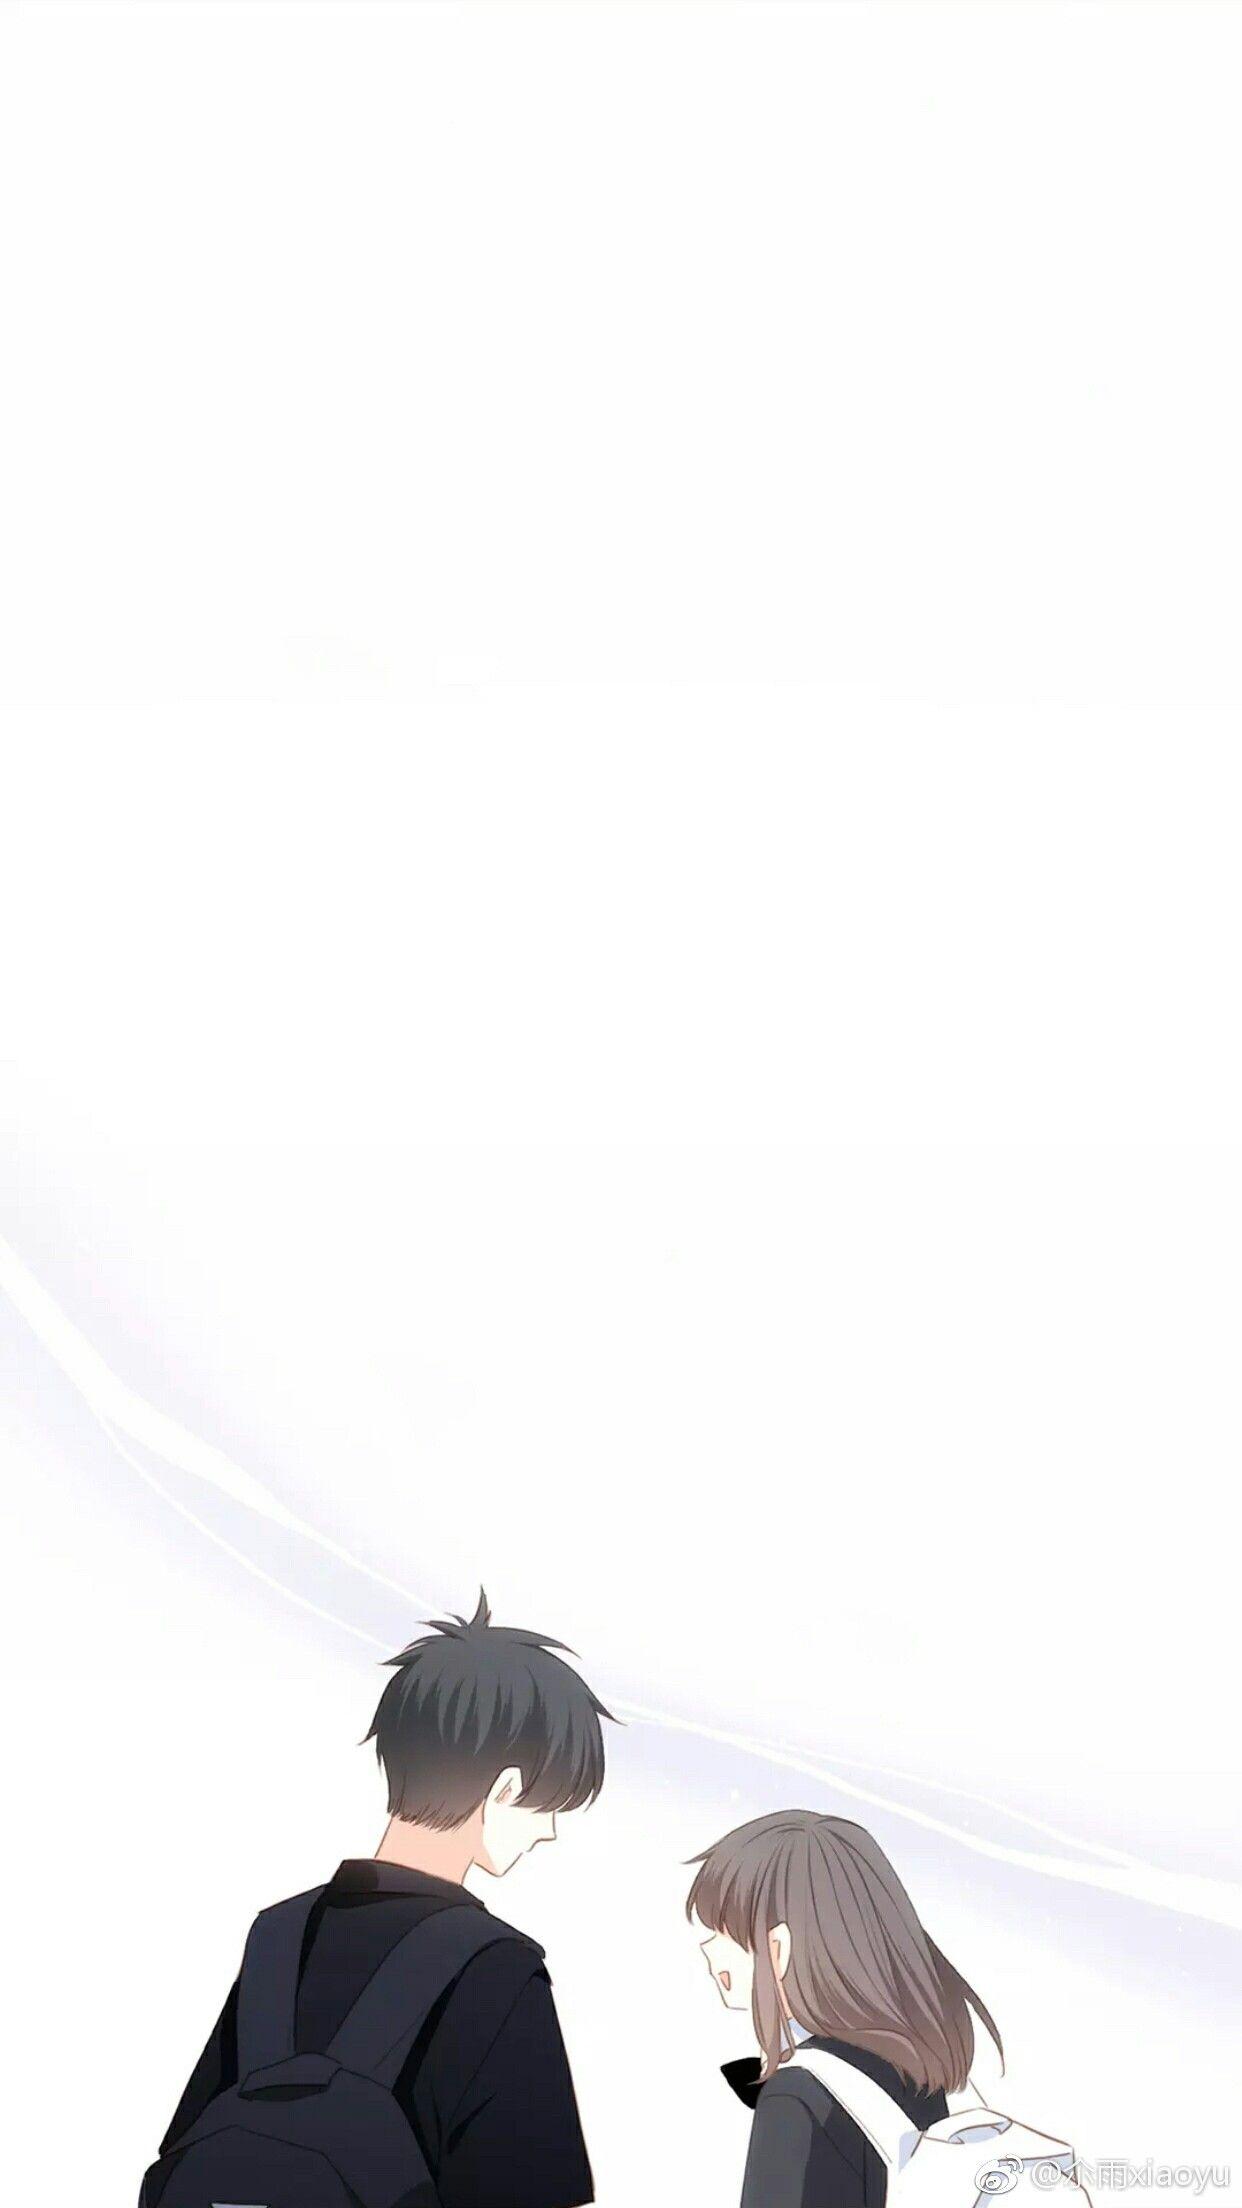 Pin Oleh Sam Eliseo Di Book Covers Pasangan Animasi Pasangan Anime Lucu Orang Animasi